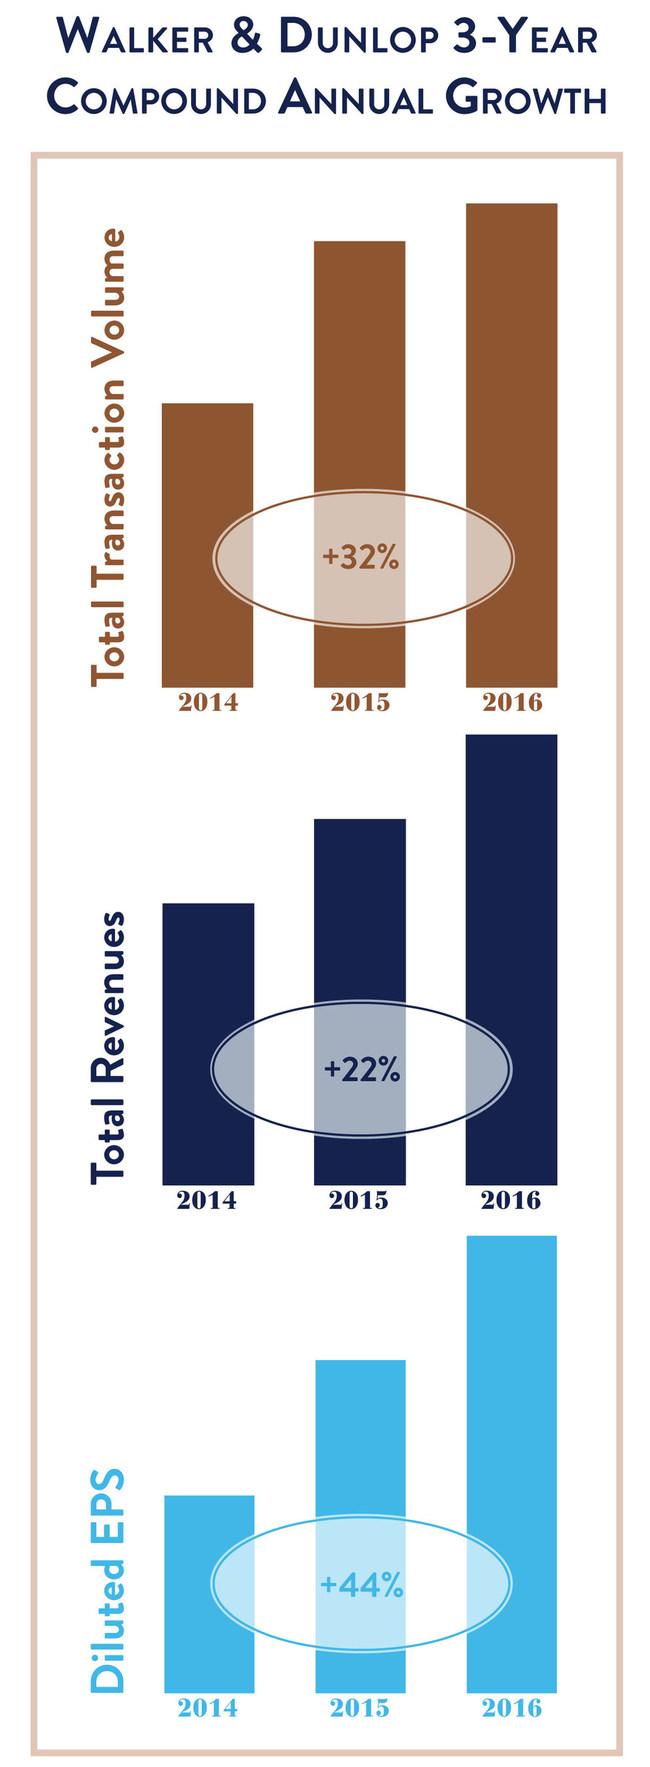 Walker & Dunlop 3-Year Compound Annual Growth